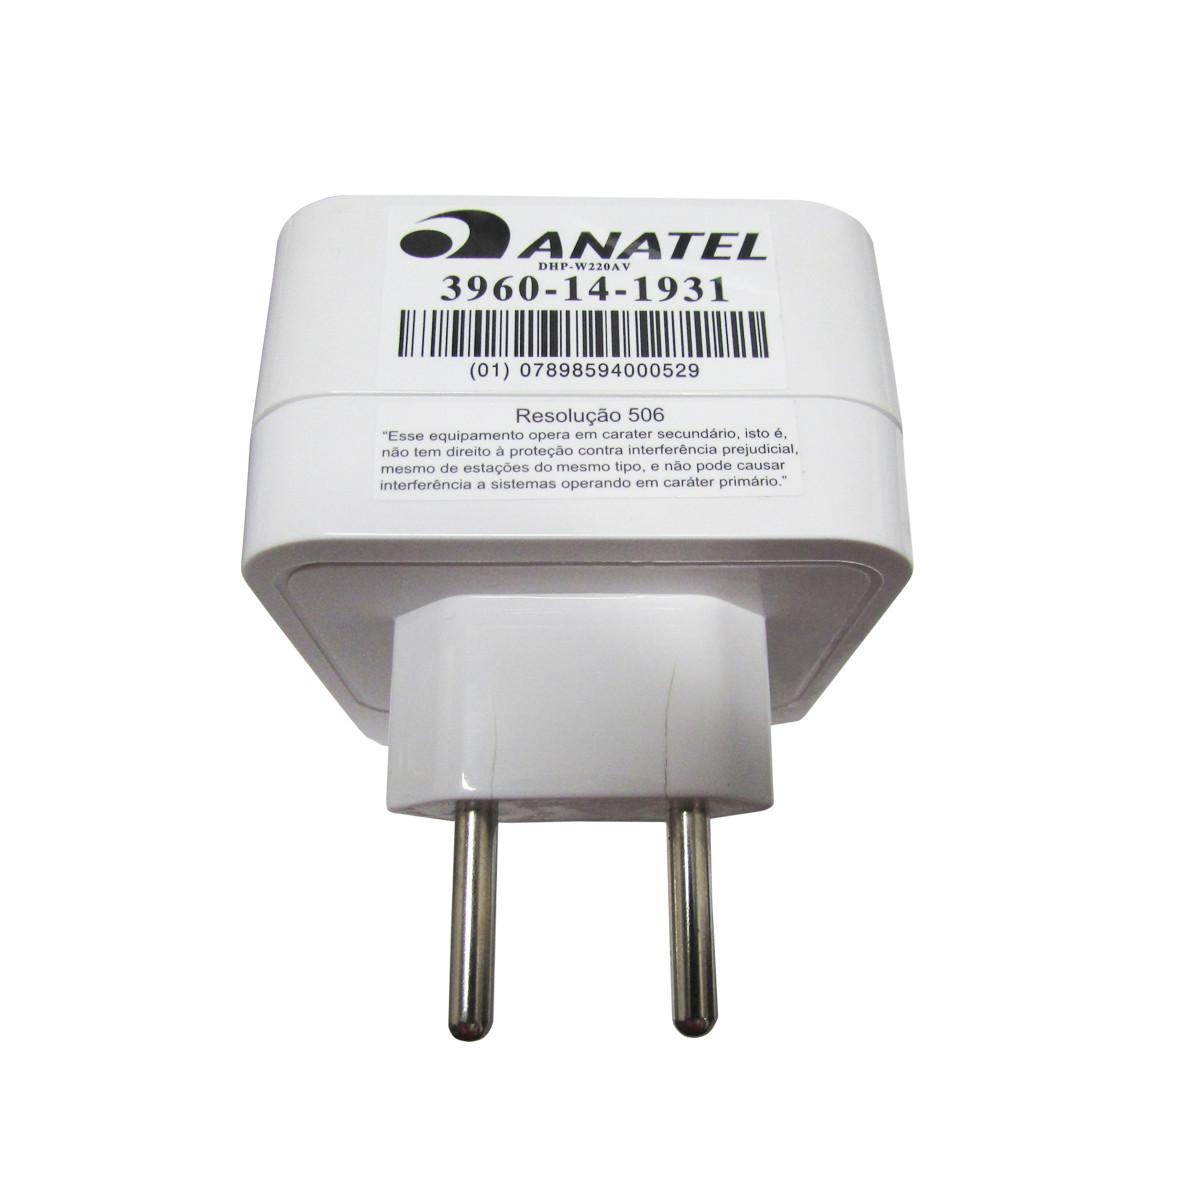 Repetidor de Wireless D-Link Powerline Kit DHP-W221AV - CAIXA ABERTA